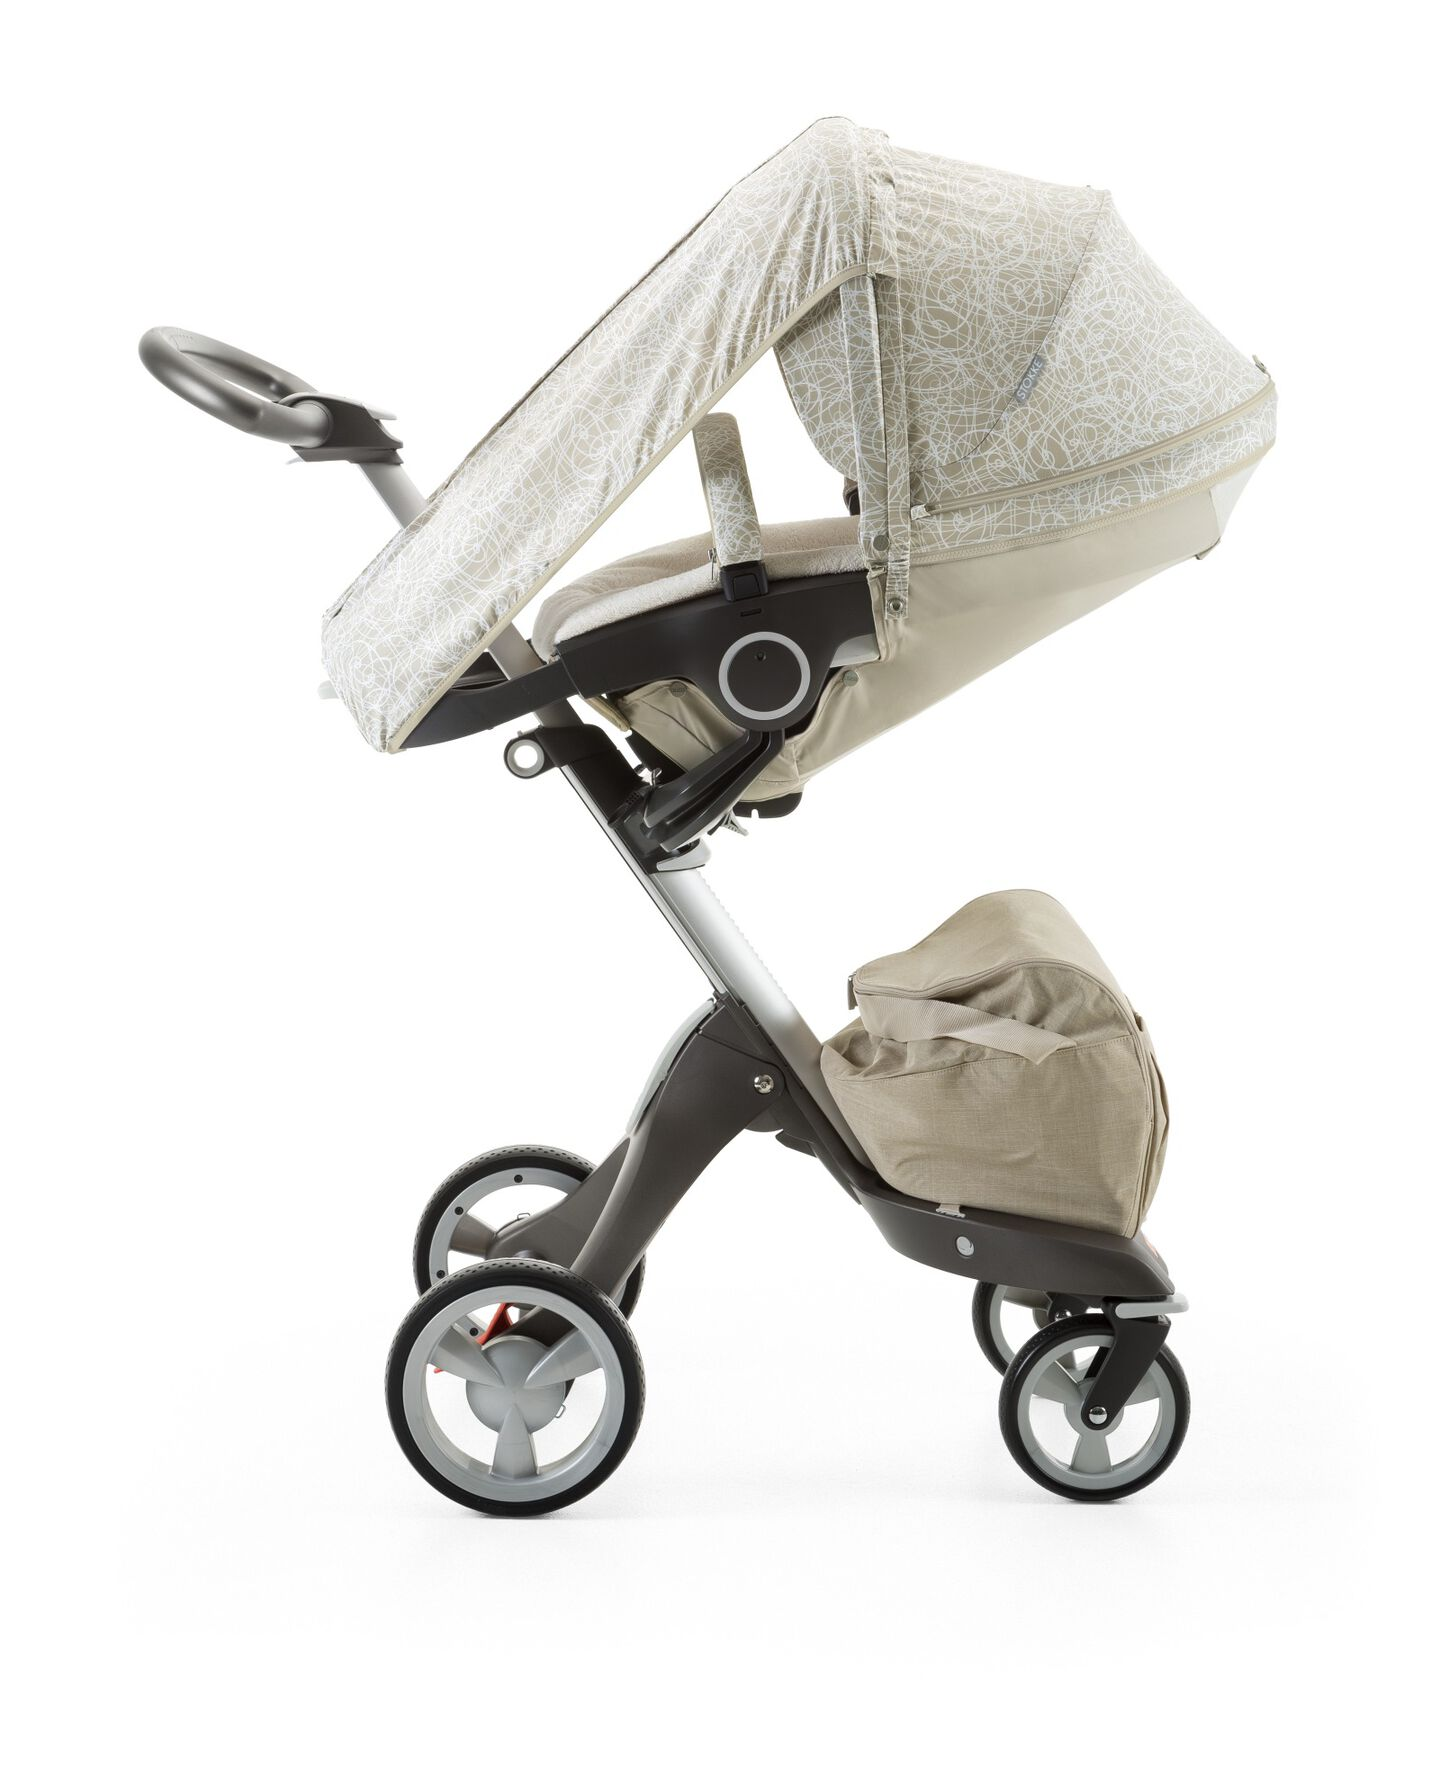 Stokke® Xplory® with Stokke® Stroller Summer Kit Scribble Sandy Beige.